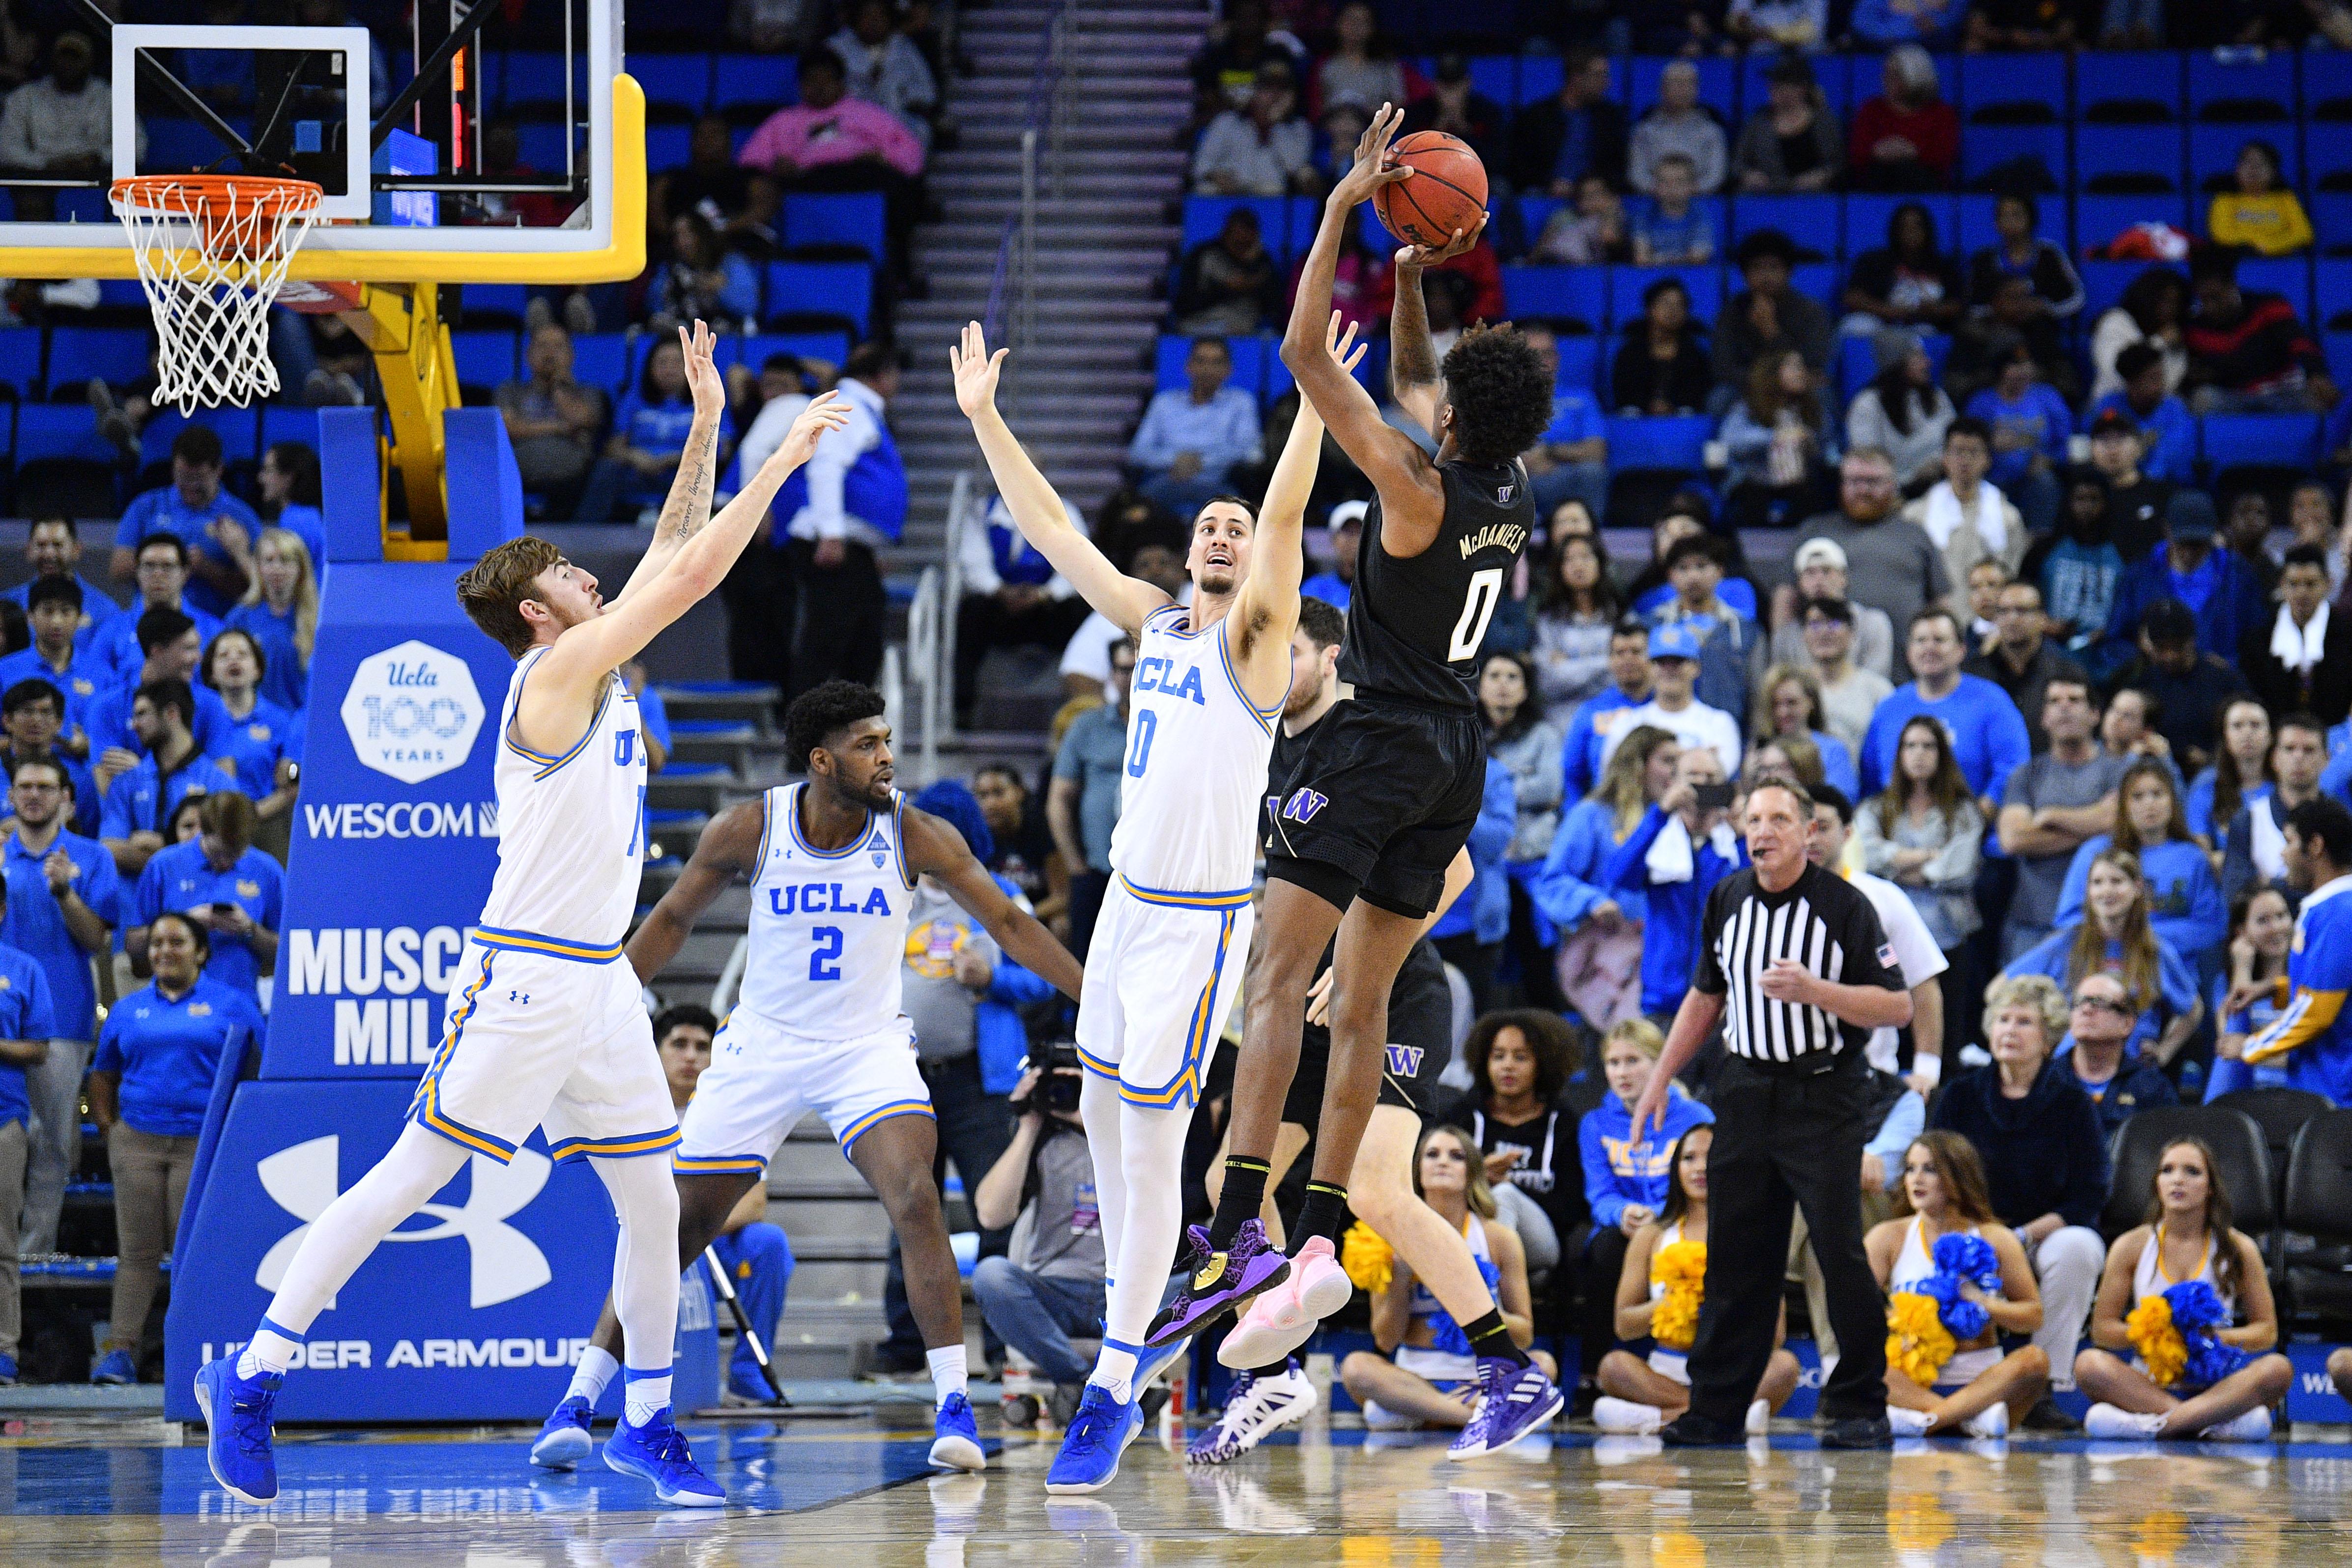 COLLEGE BASKETBALL: FEB 15 Washington at UCLA